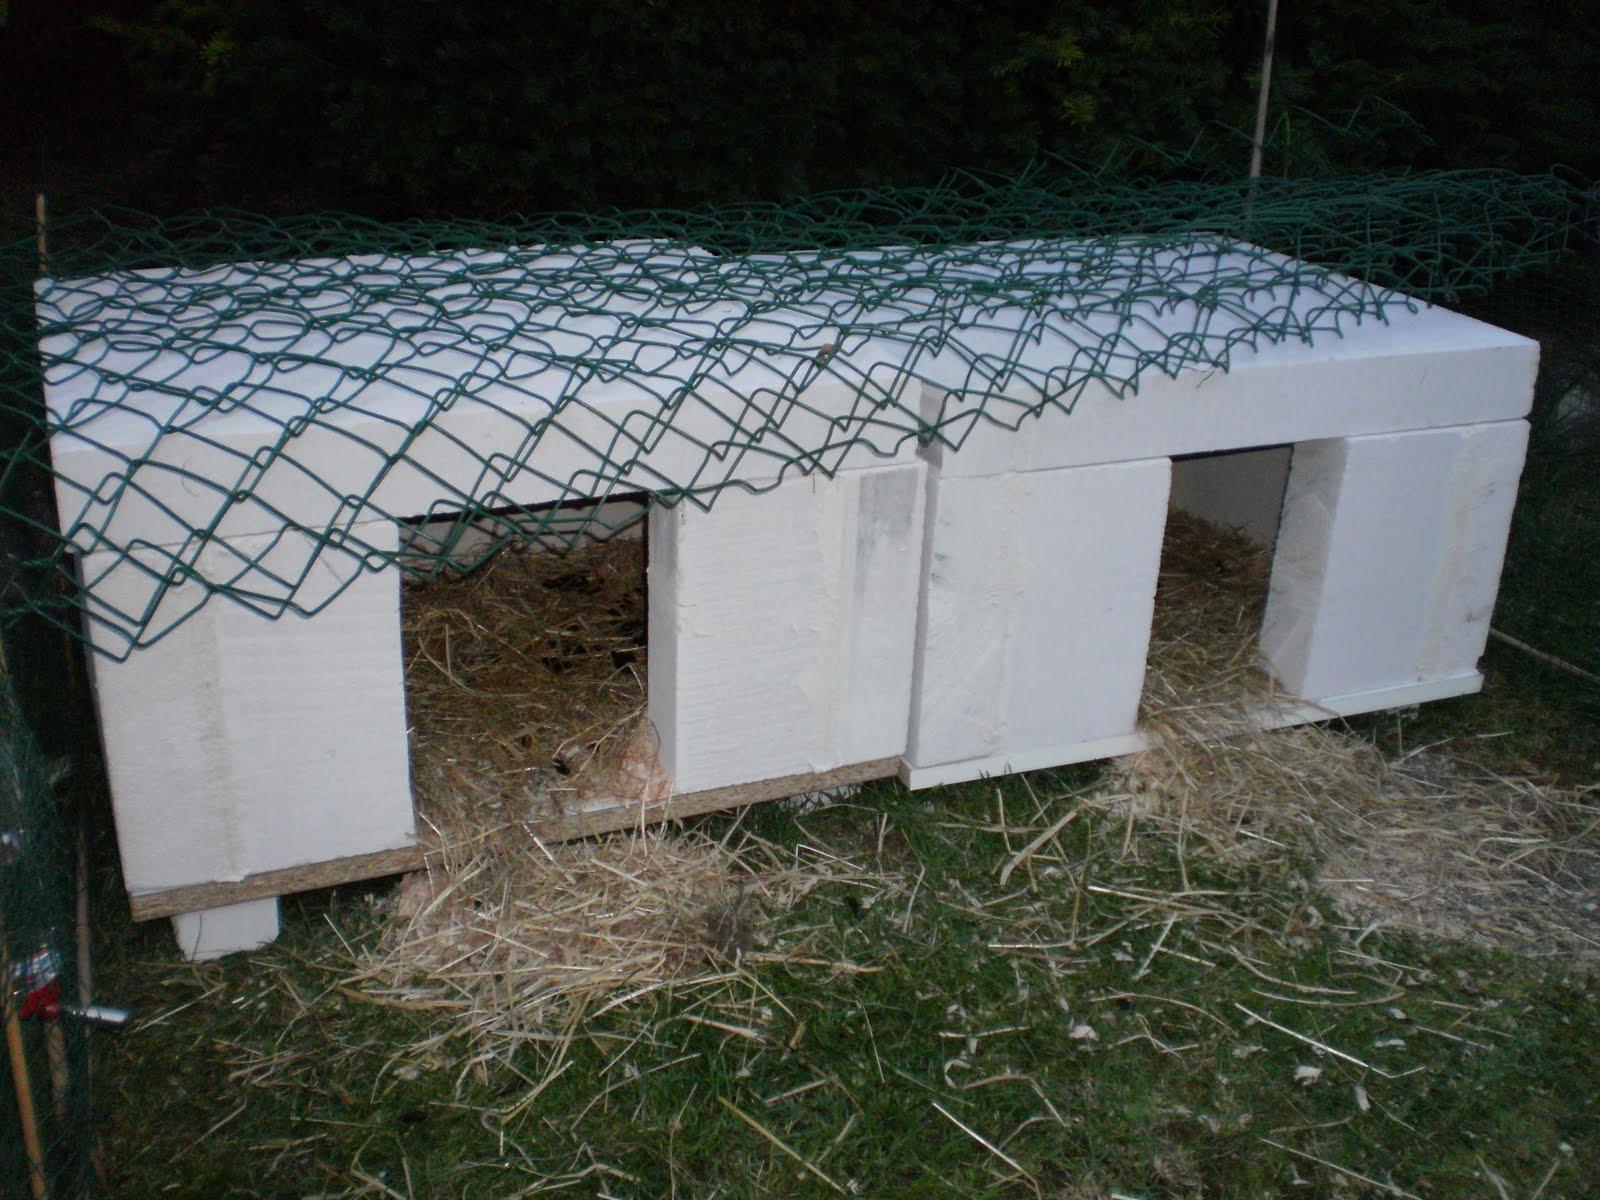 mes cochons d 39 inde d 39 amour enclos de septembre 2010. Black Bedroom Furniture Sets. Home Design Ideas